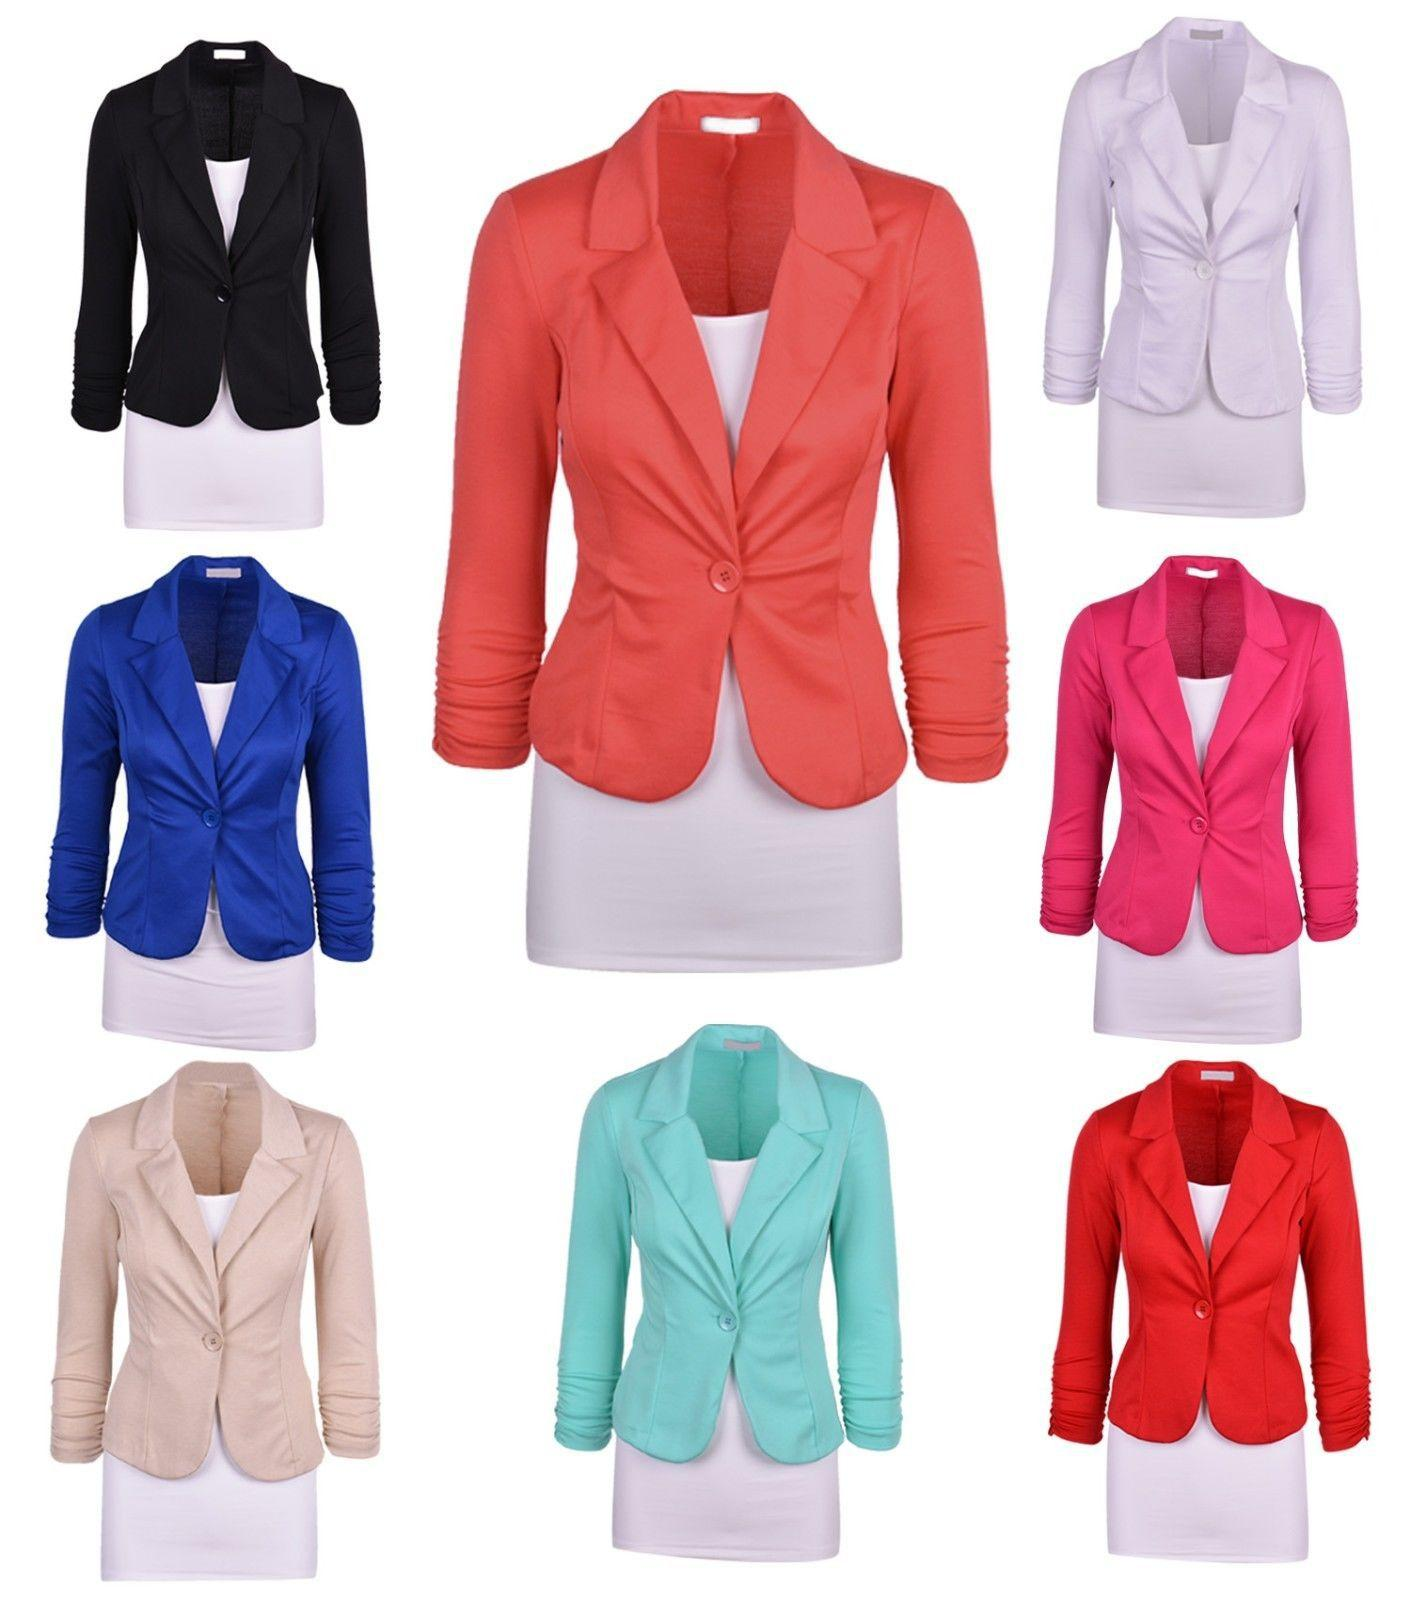 5bb2c6b666 Blazer Female Blue Women Suit Office Ladies New Spring Slim Top Elegant  Short Design Clothes One Buckle Suit Woman Coat Designer Leather Jackets  Avirex ...